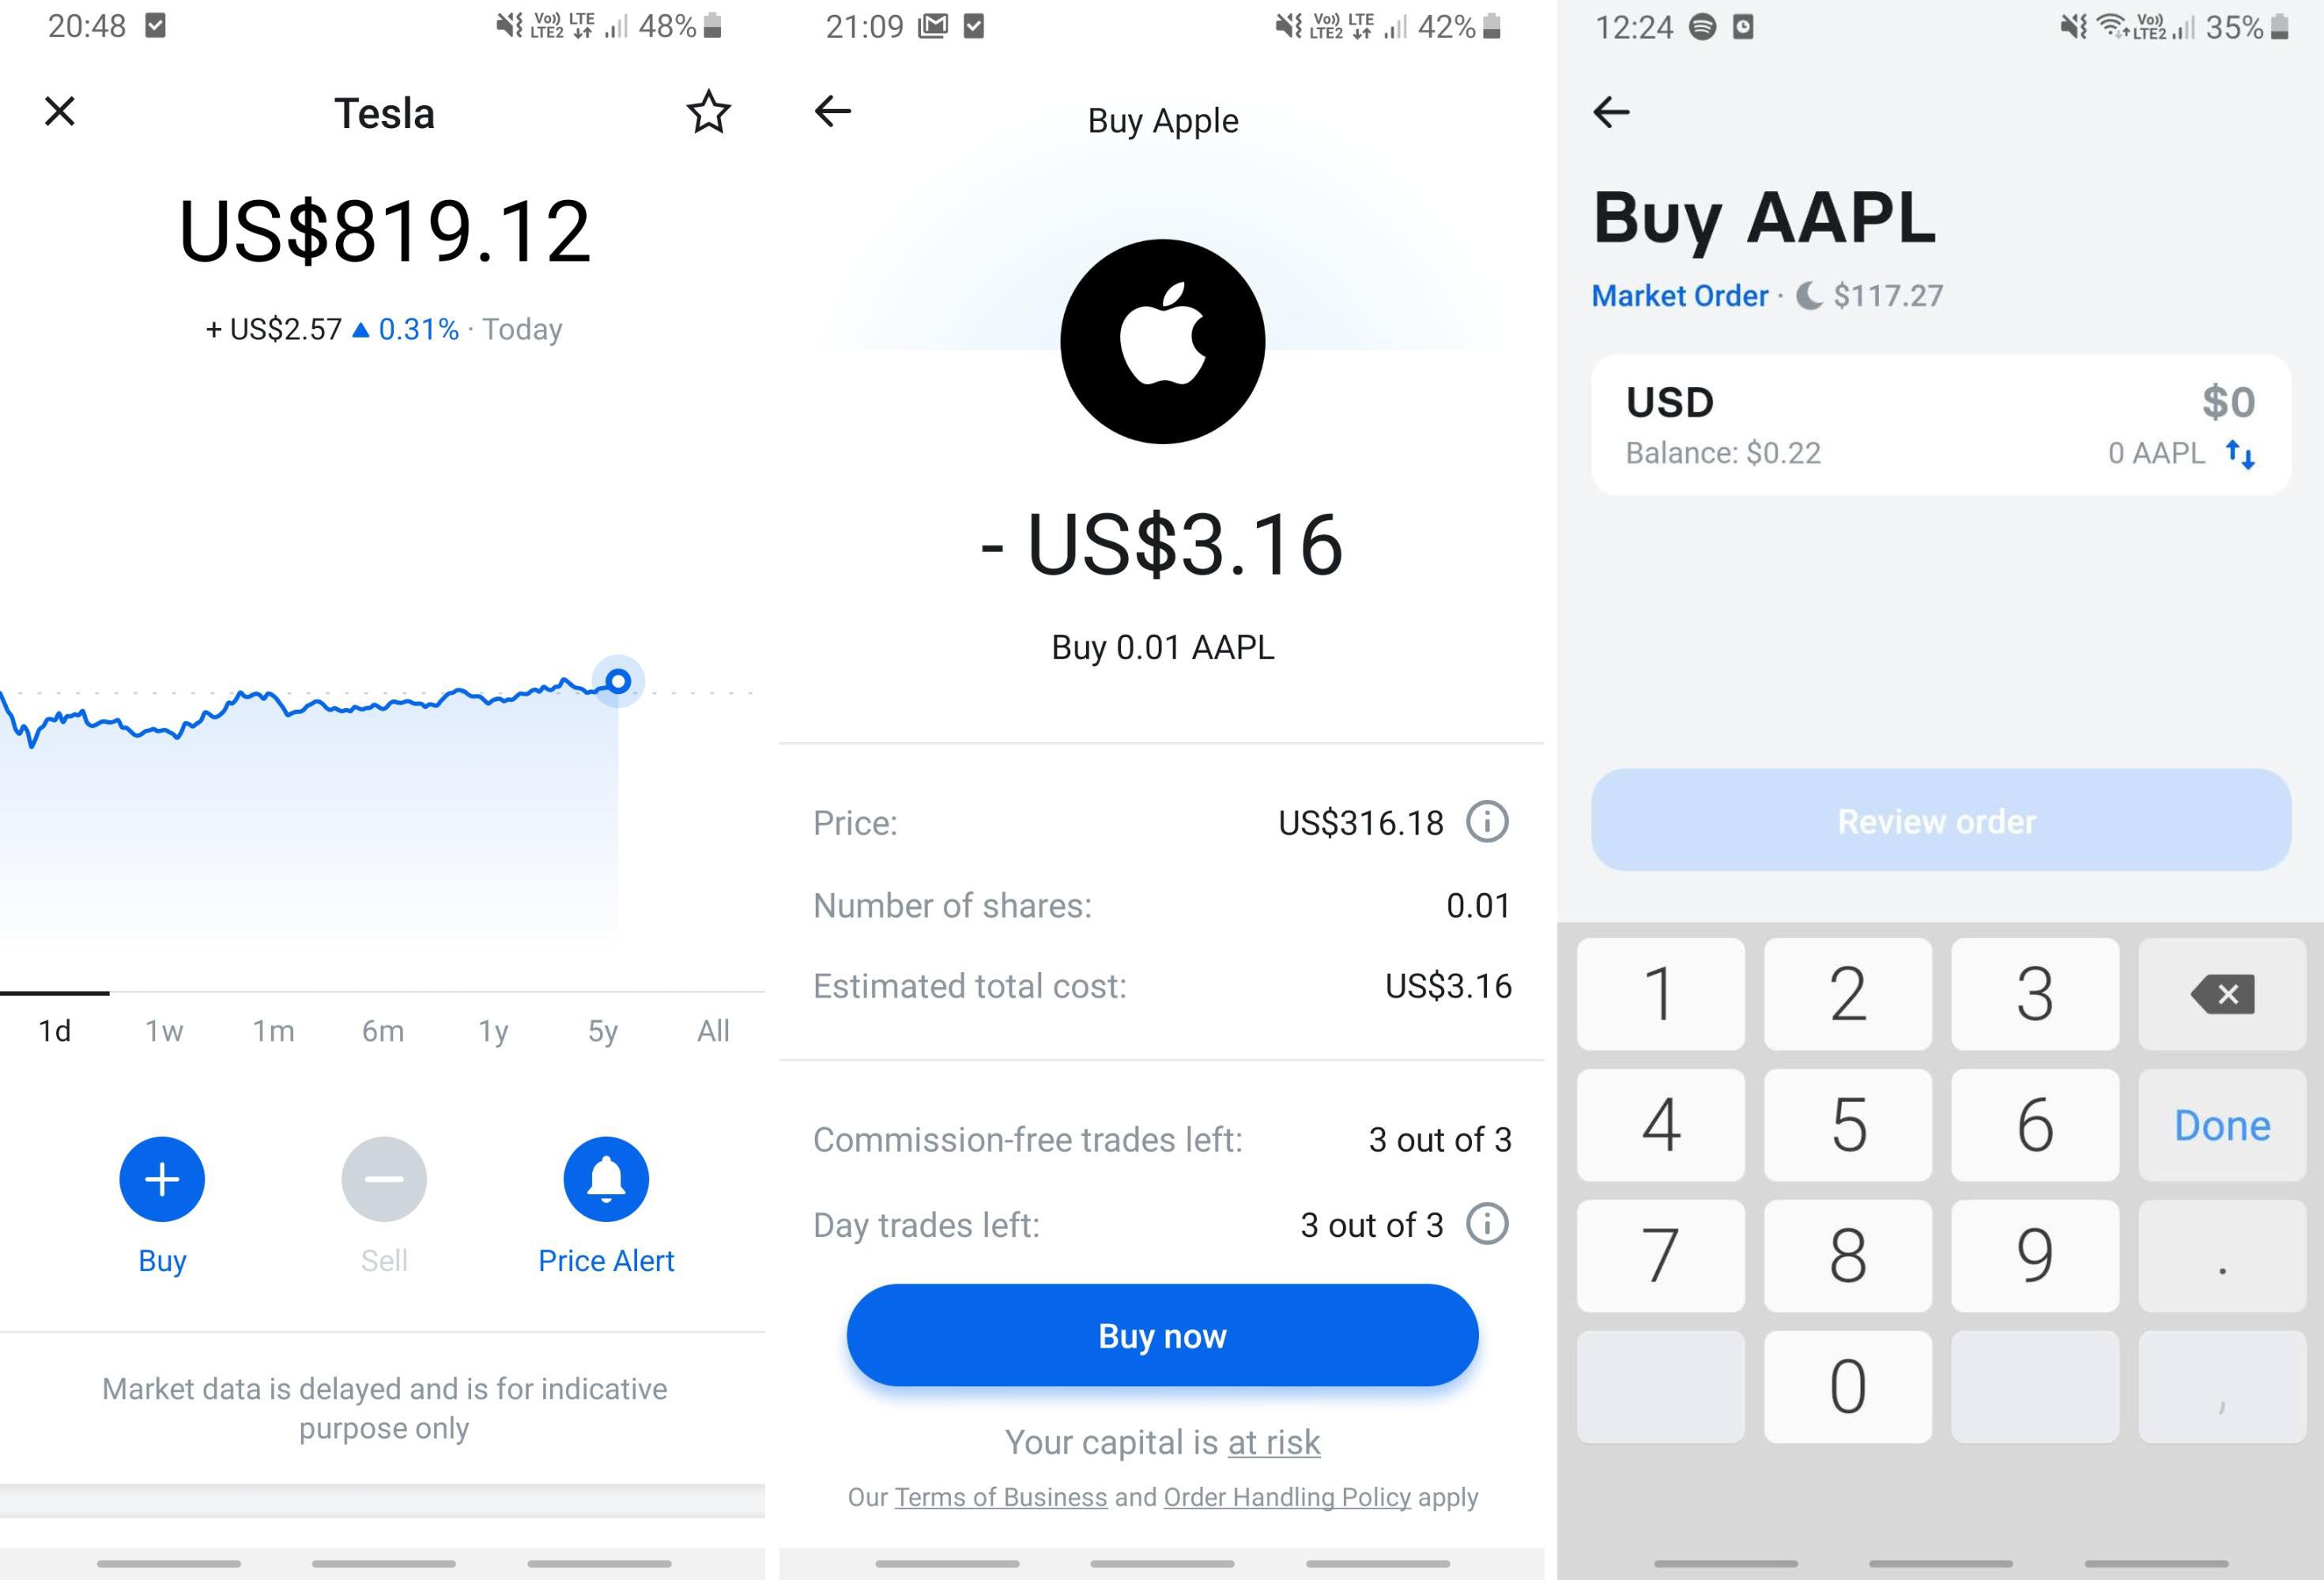 stock purchasing flow in Revolut app